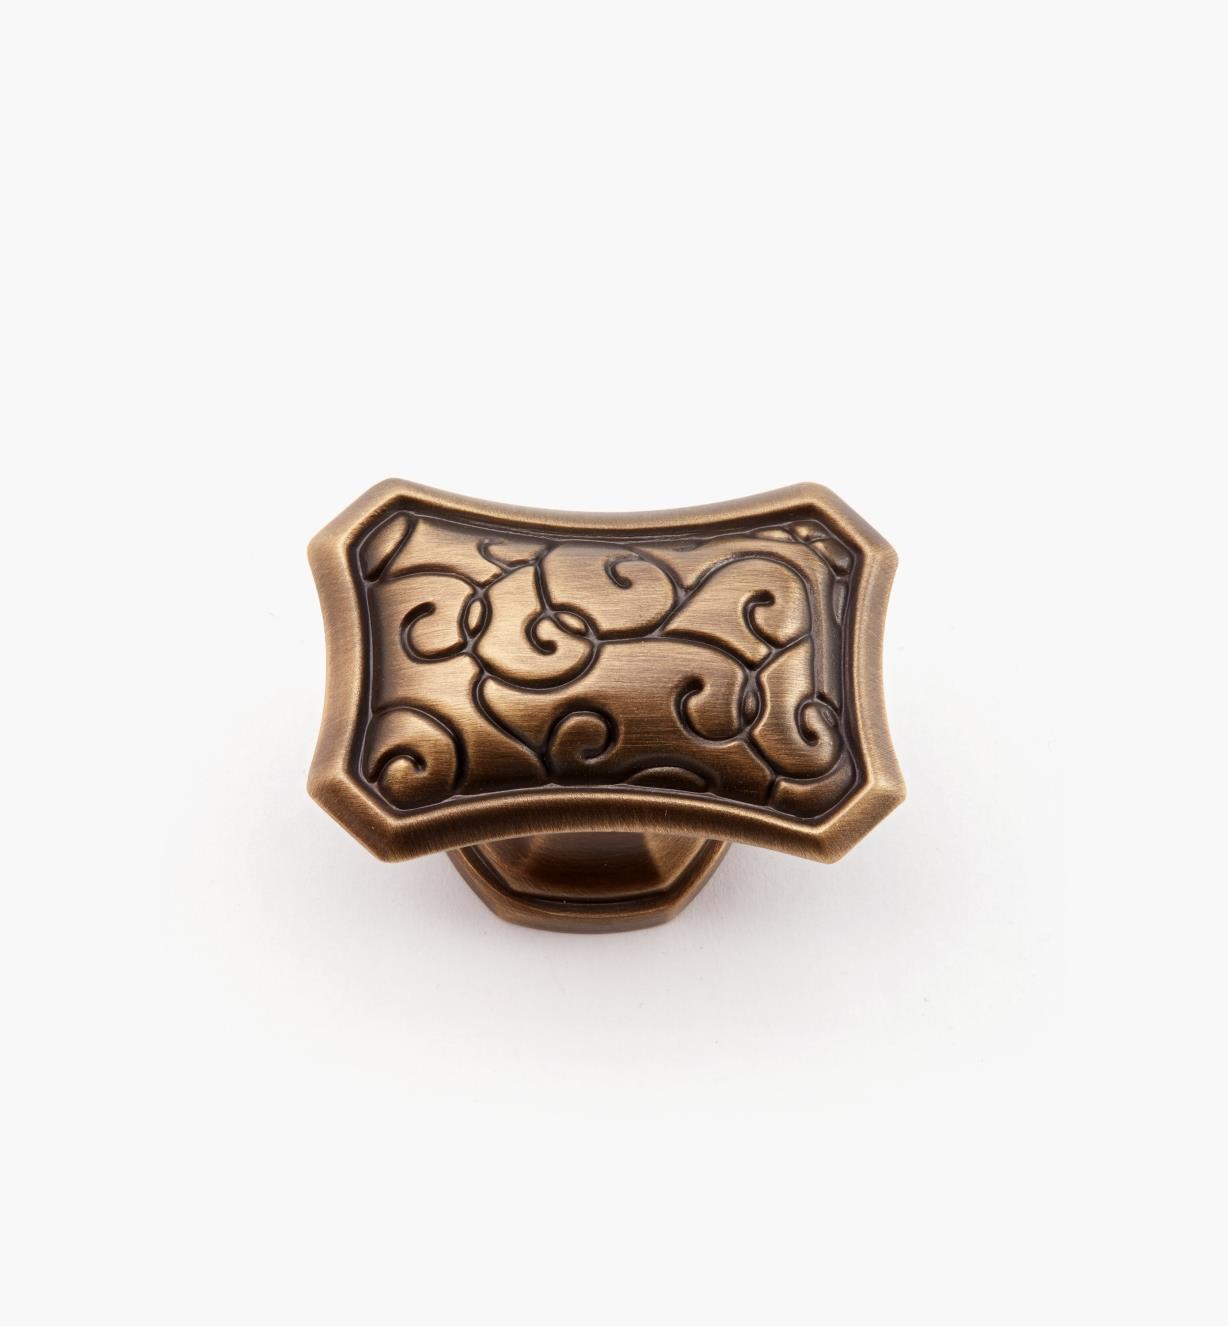 02A5212 - Bouton rectangulaire de 13/4pox 11/4po, série Bella Forma, fini bronze bruni